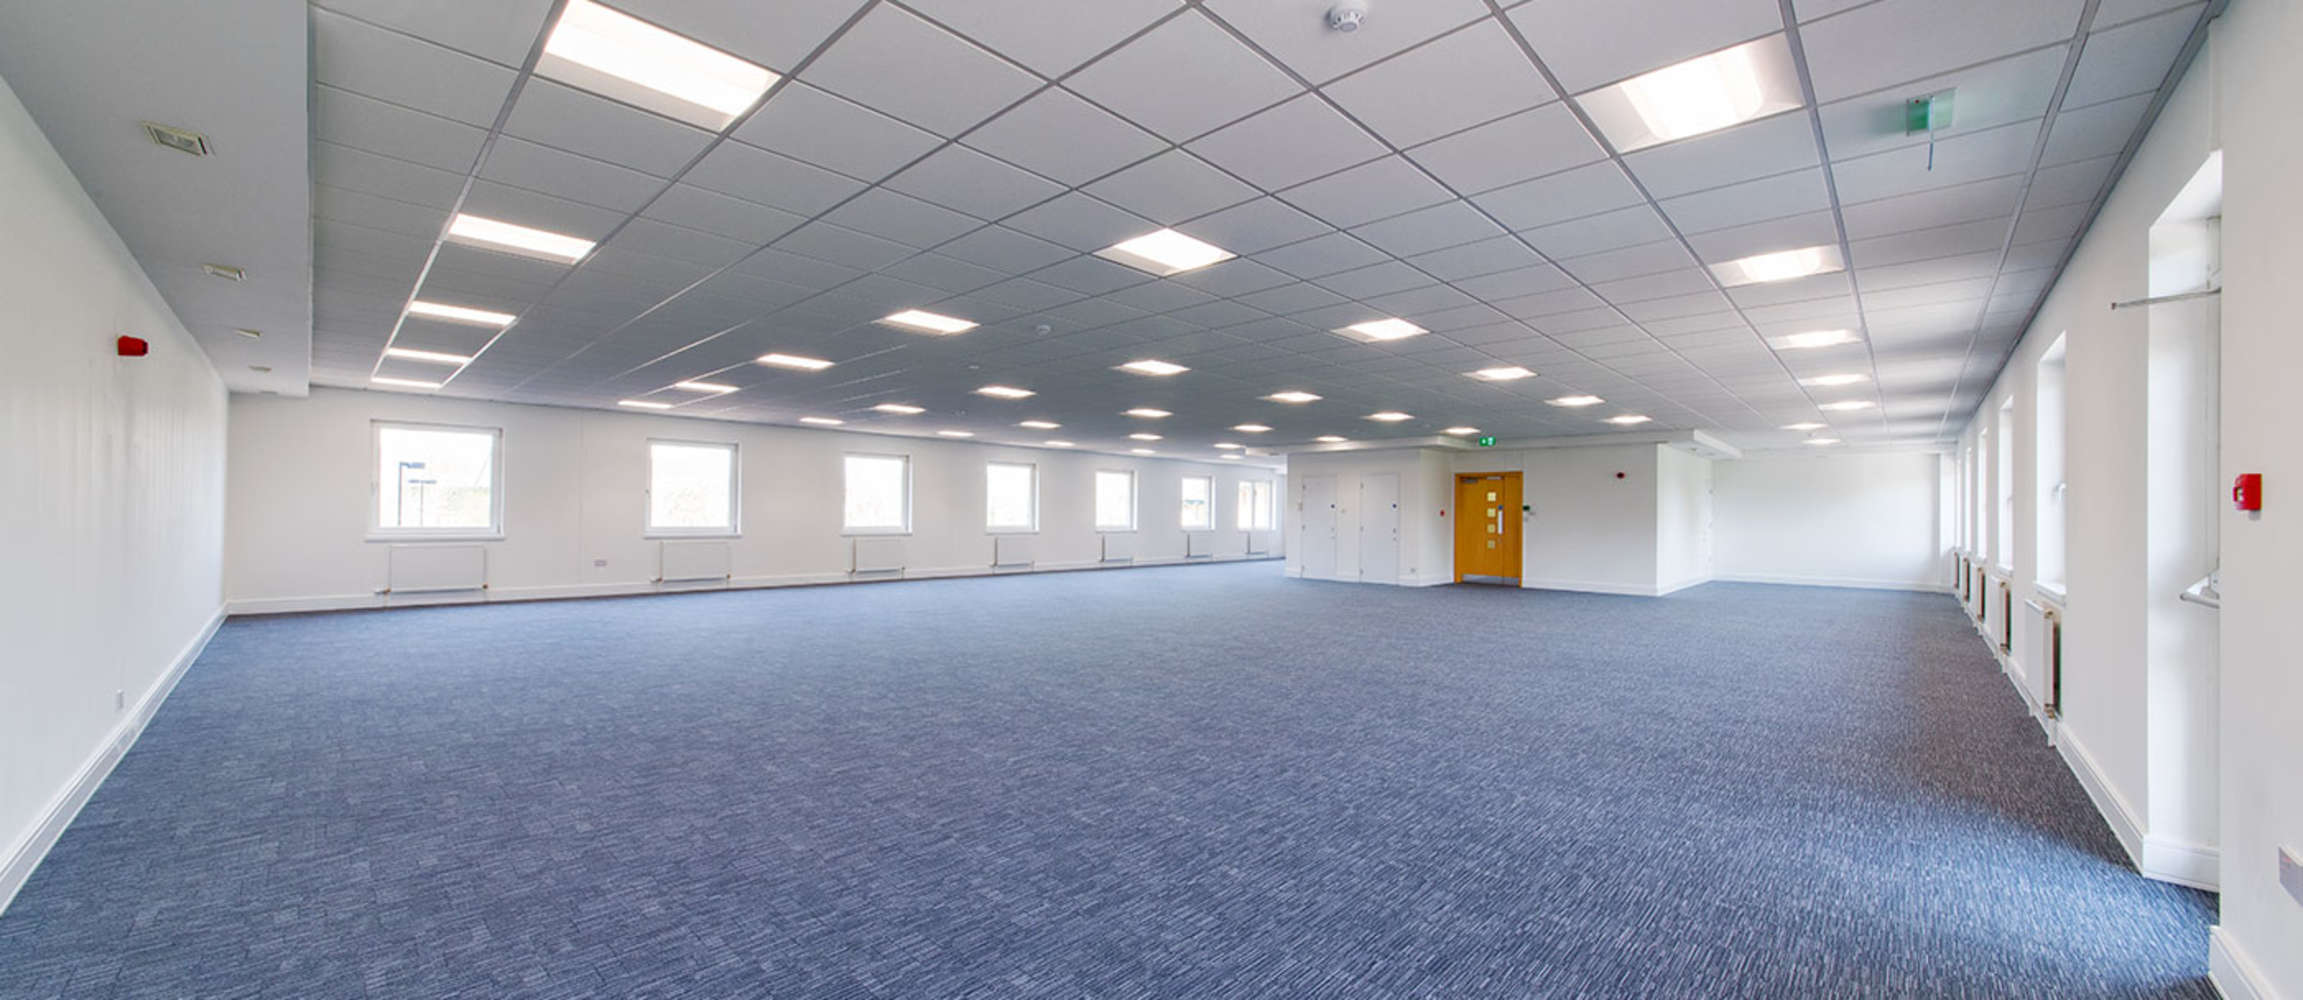 Office Birmingham, B37 7YE - 2670 Kings Court, Birmingham Business Park - 2